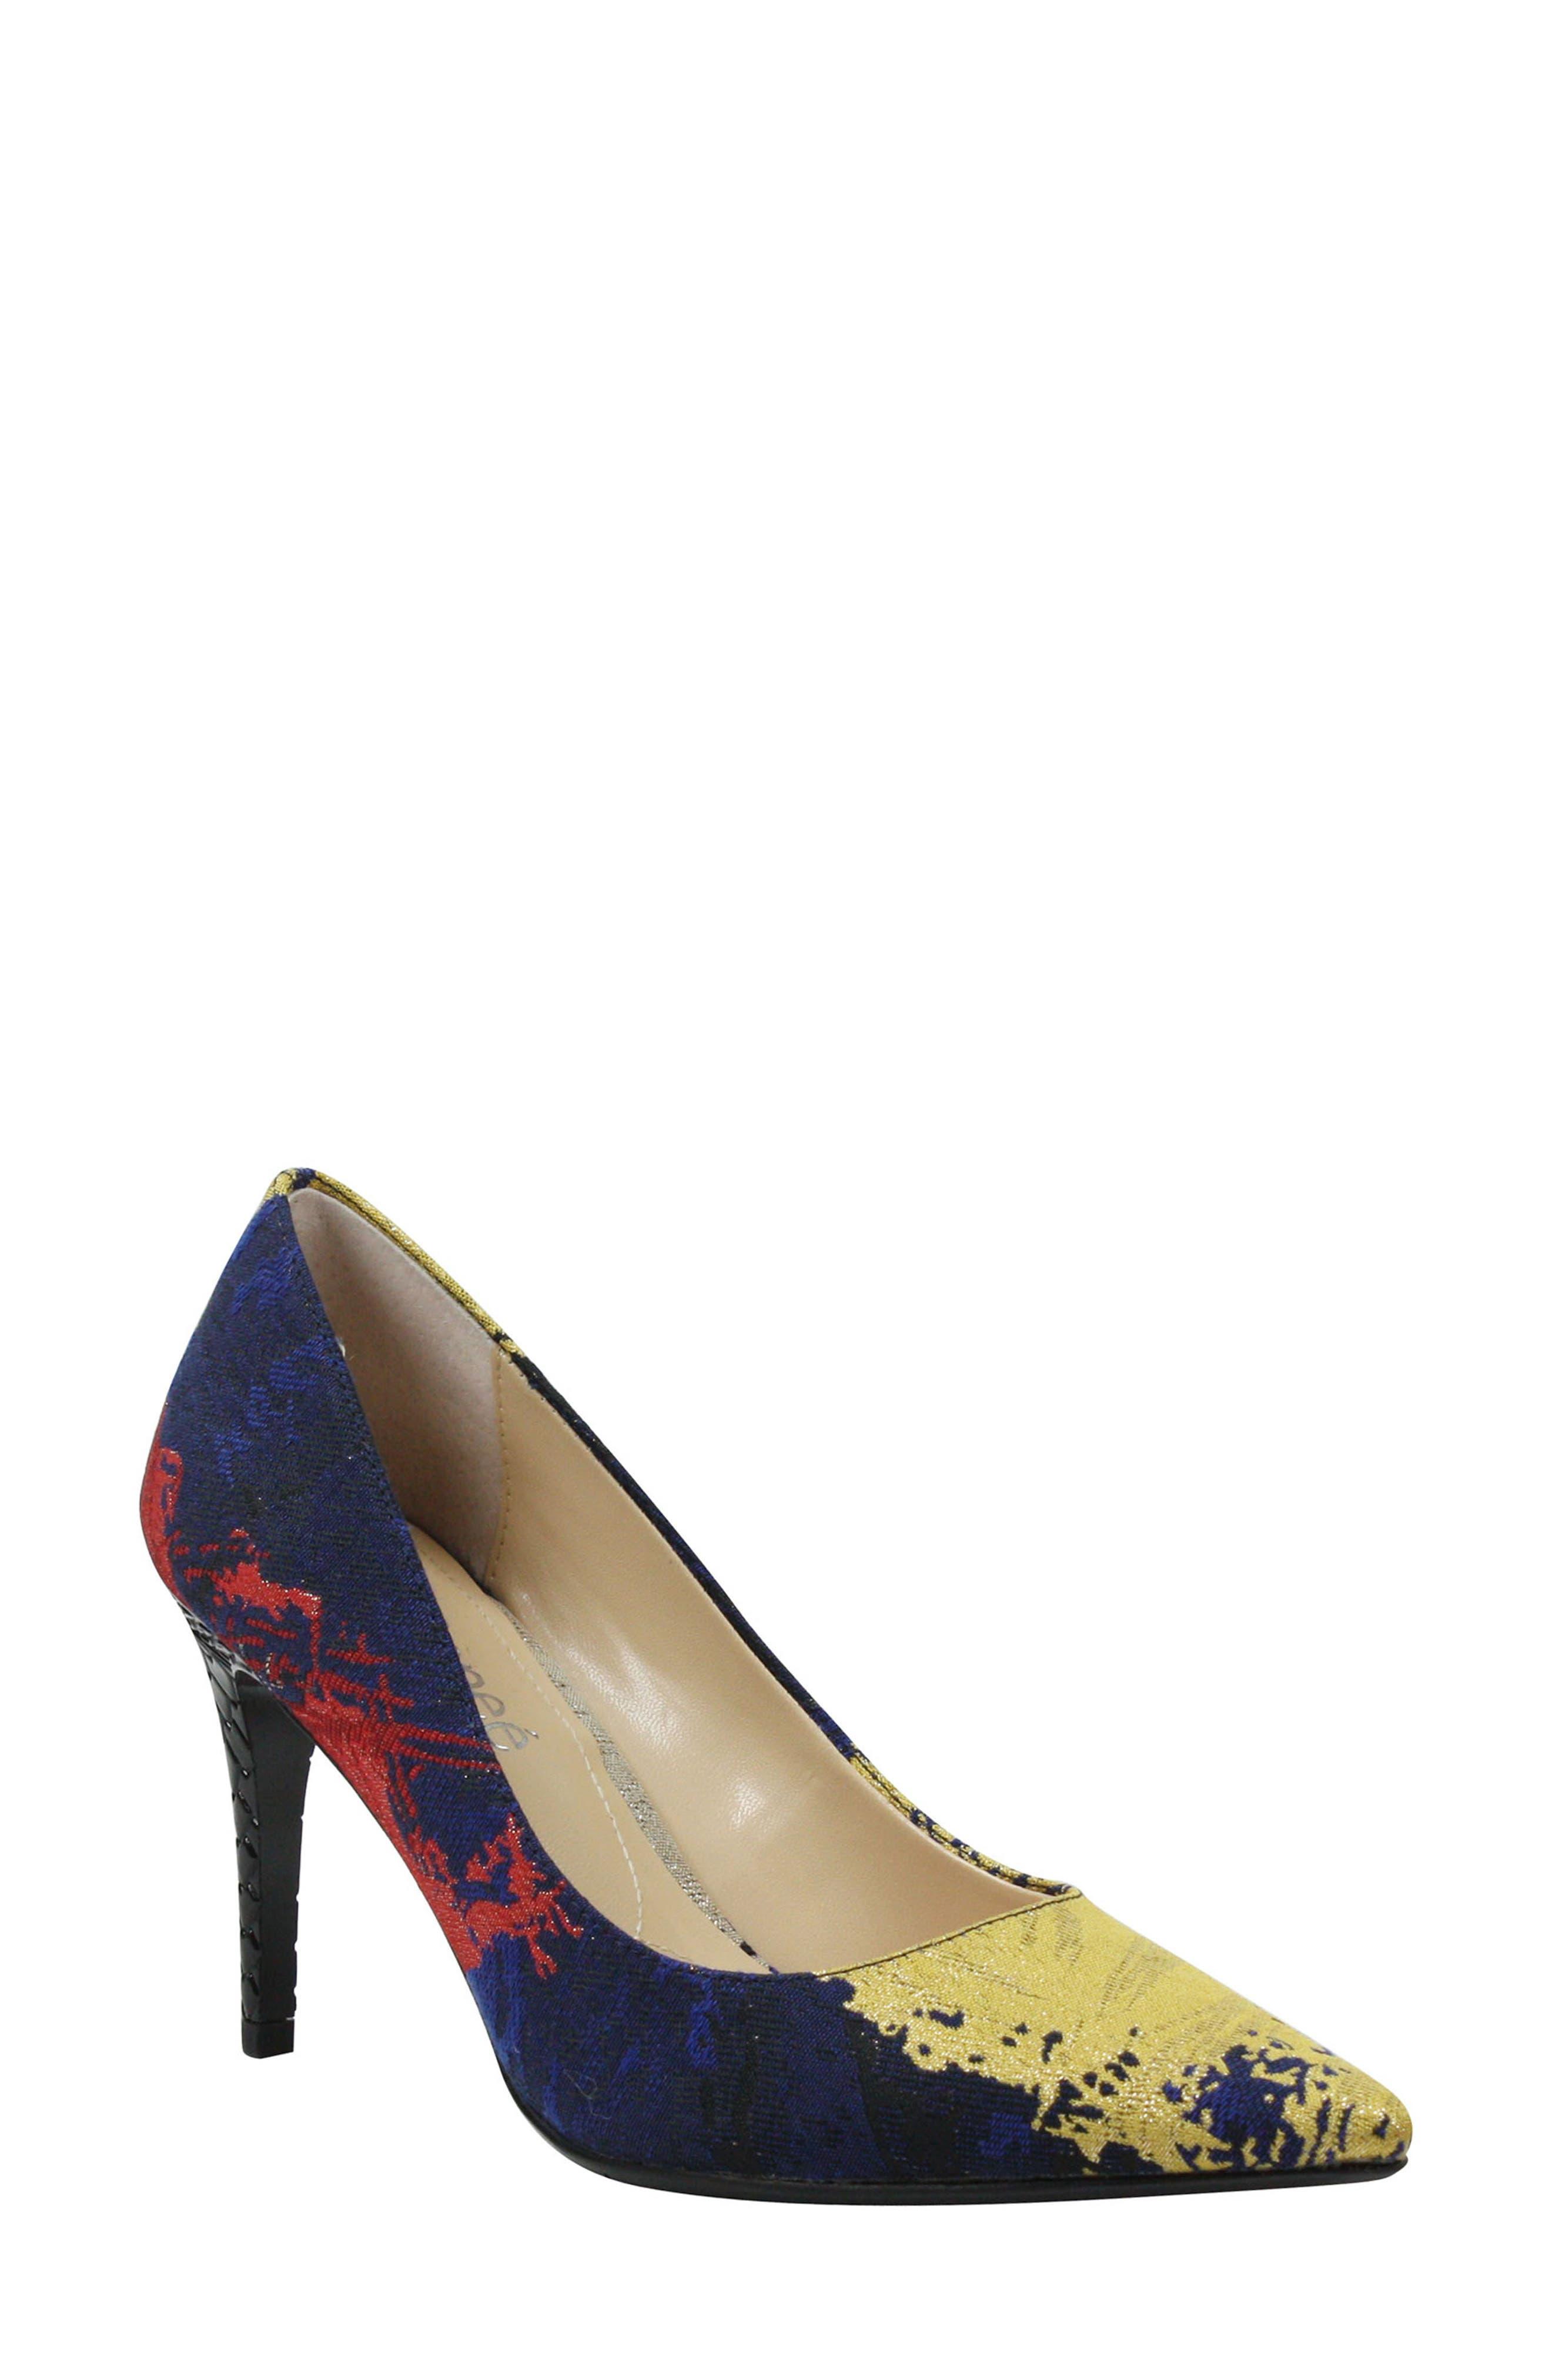 J. RENEÉ, 'Maressa' Pointy Toe Pump, Main thumbnail 1, color, BLUE/ BLACK MULTI